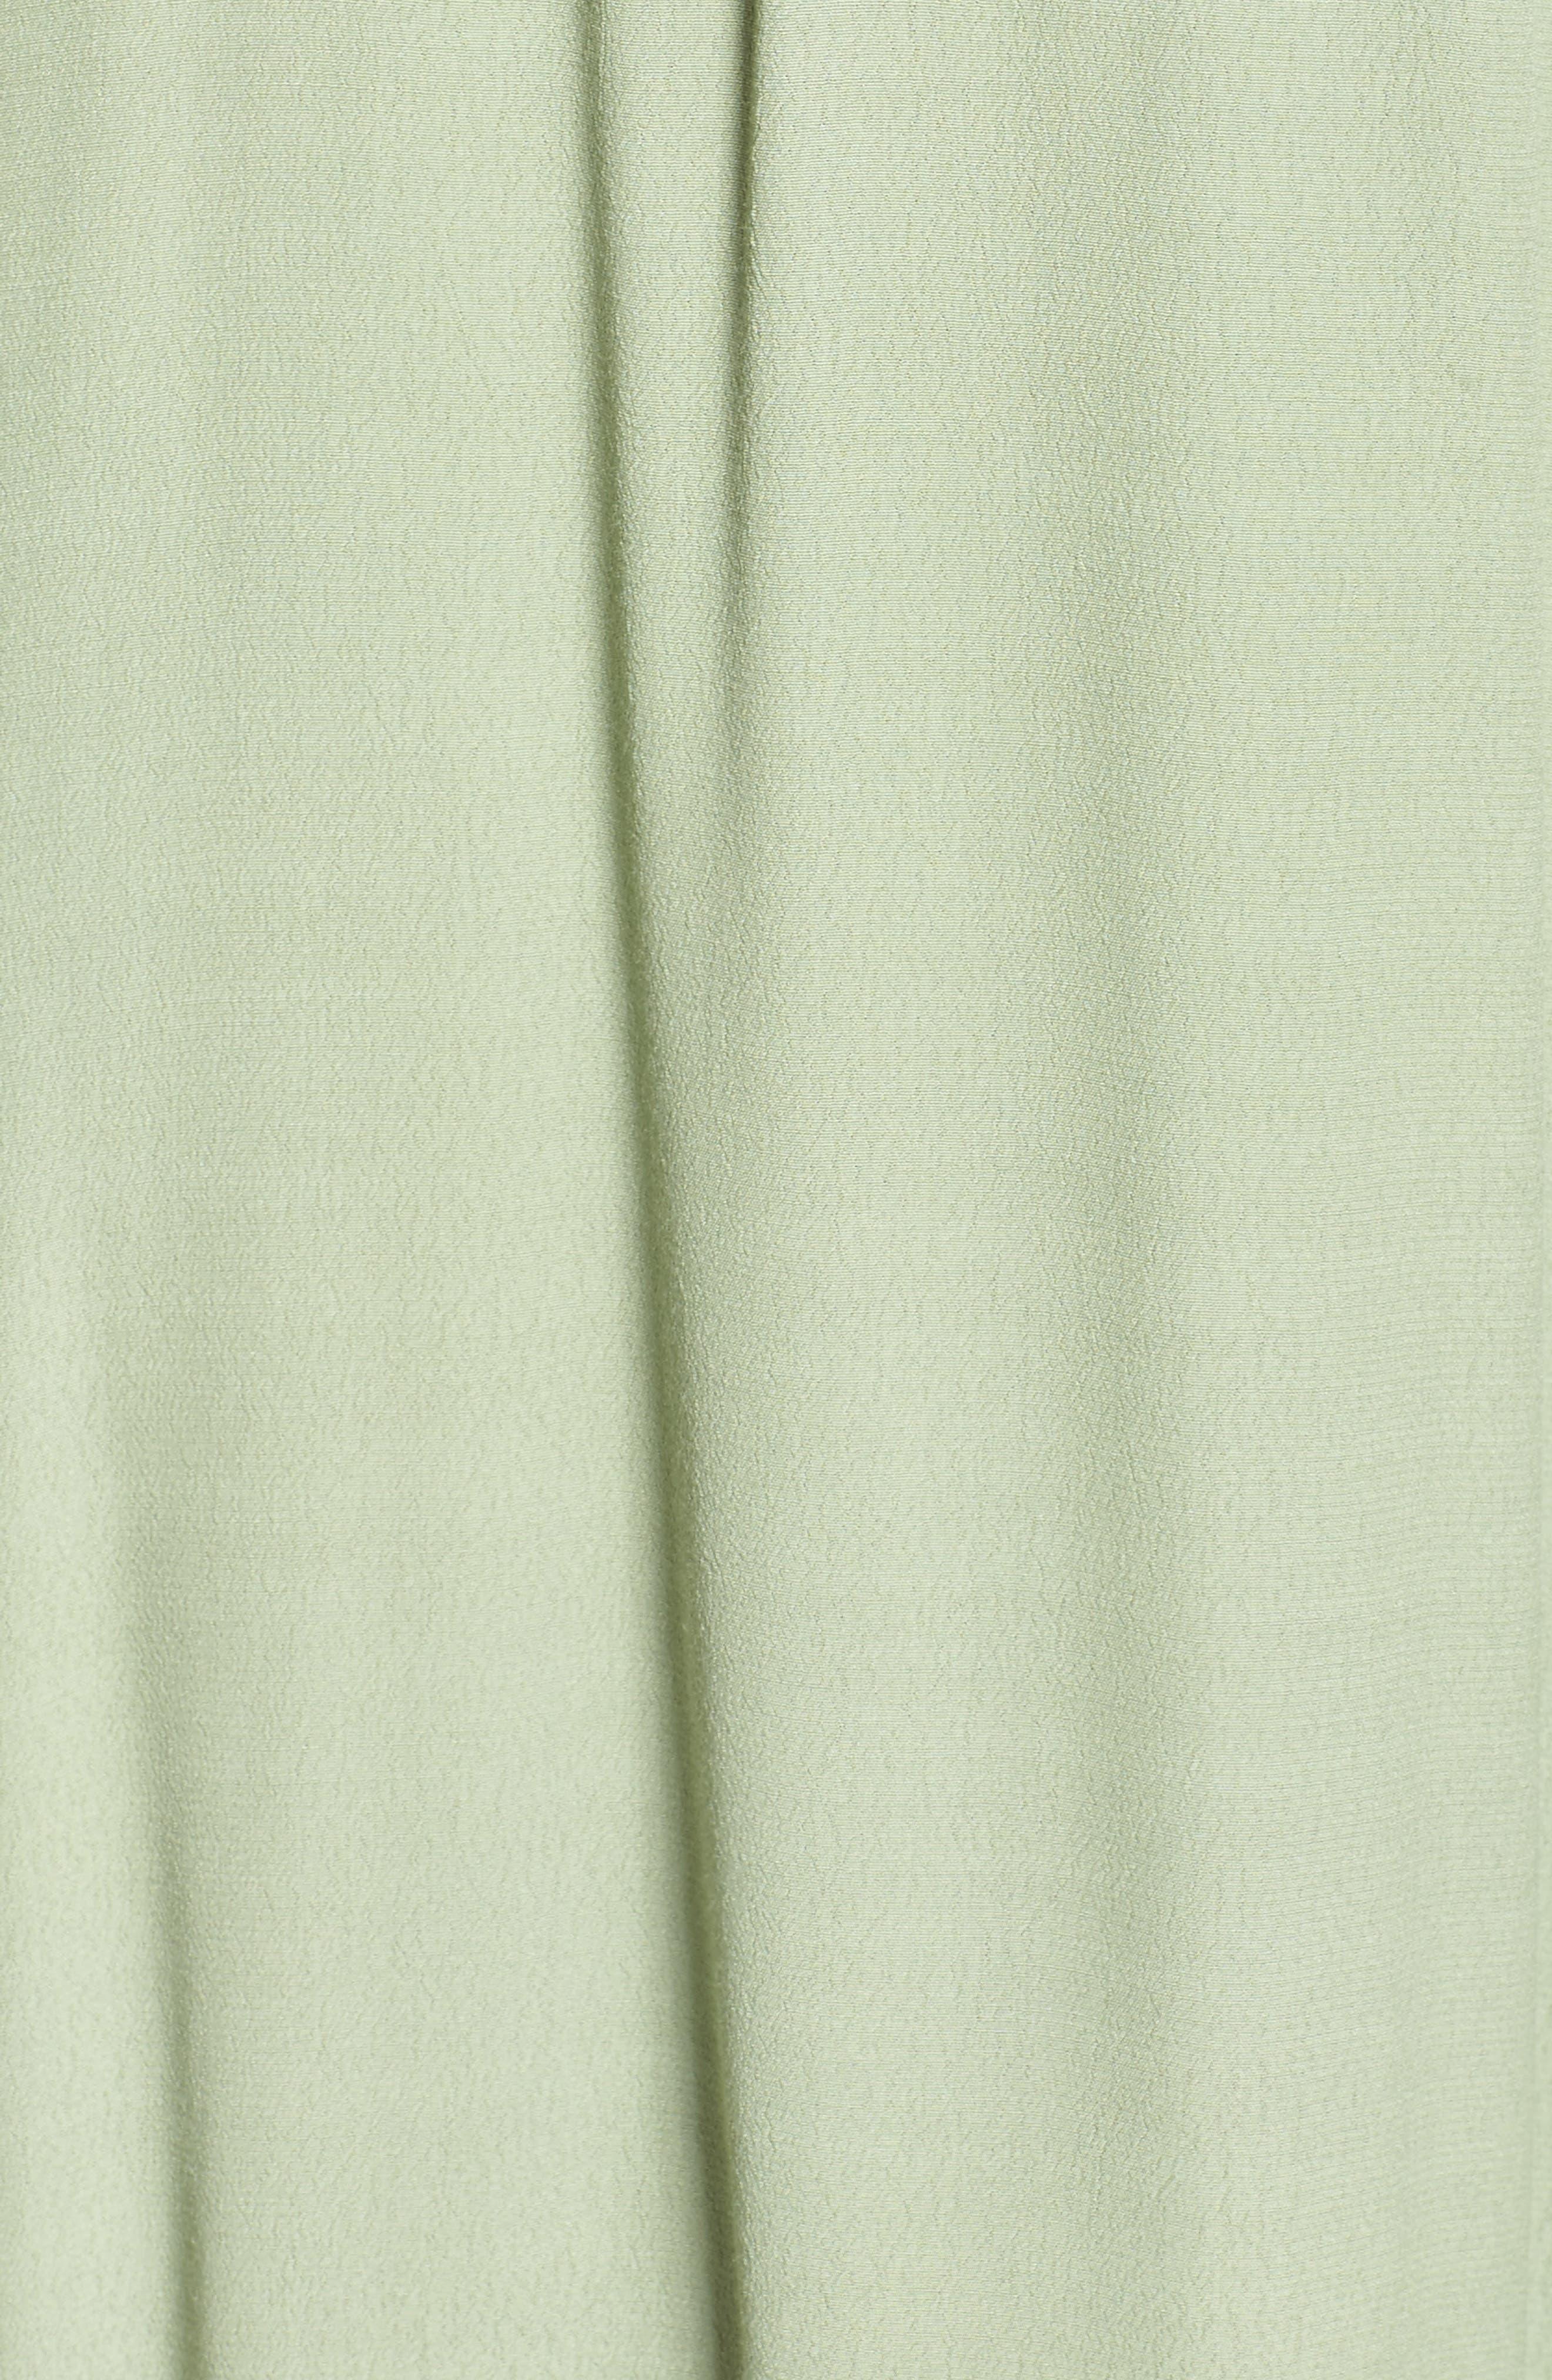 Roe + May Jolie Crepe Peplum Dress,                             Alternate thumbnail 5, color,                             Sage